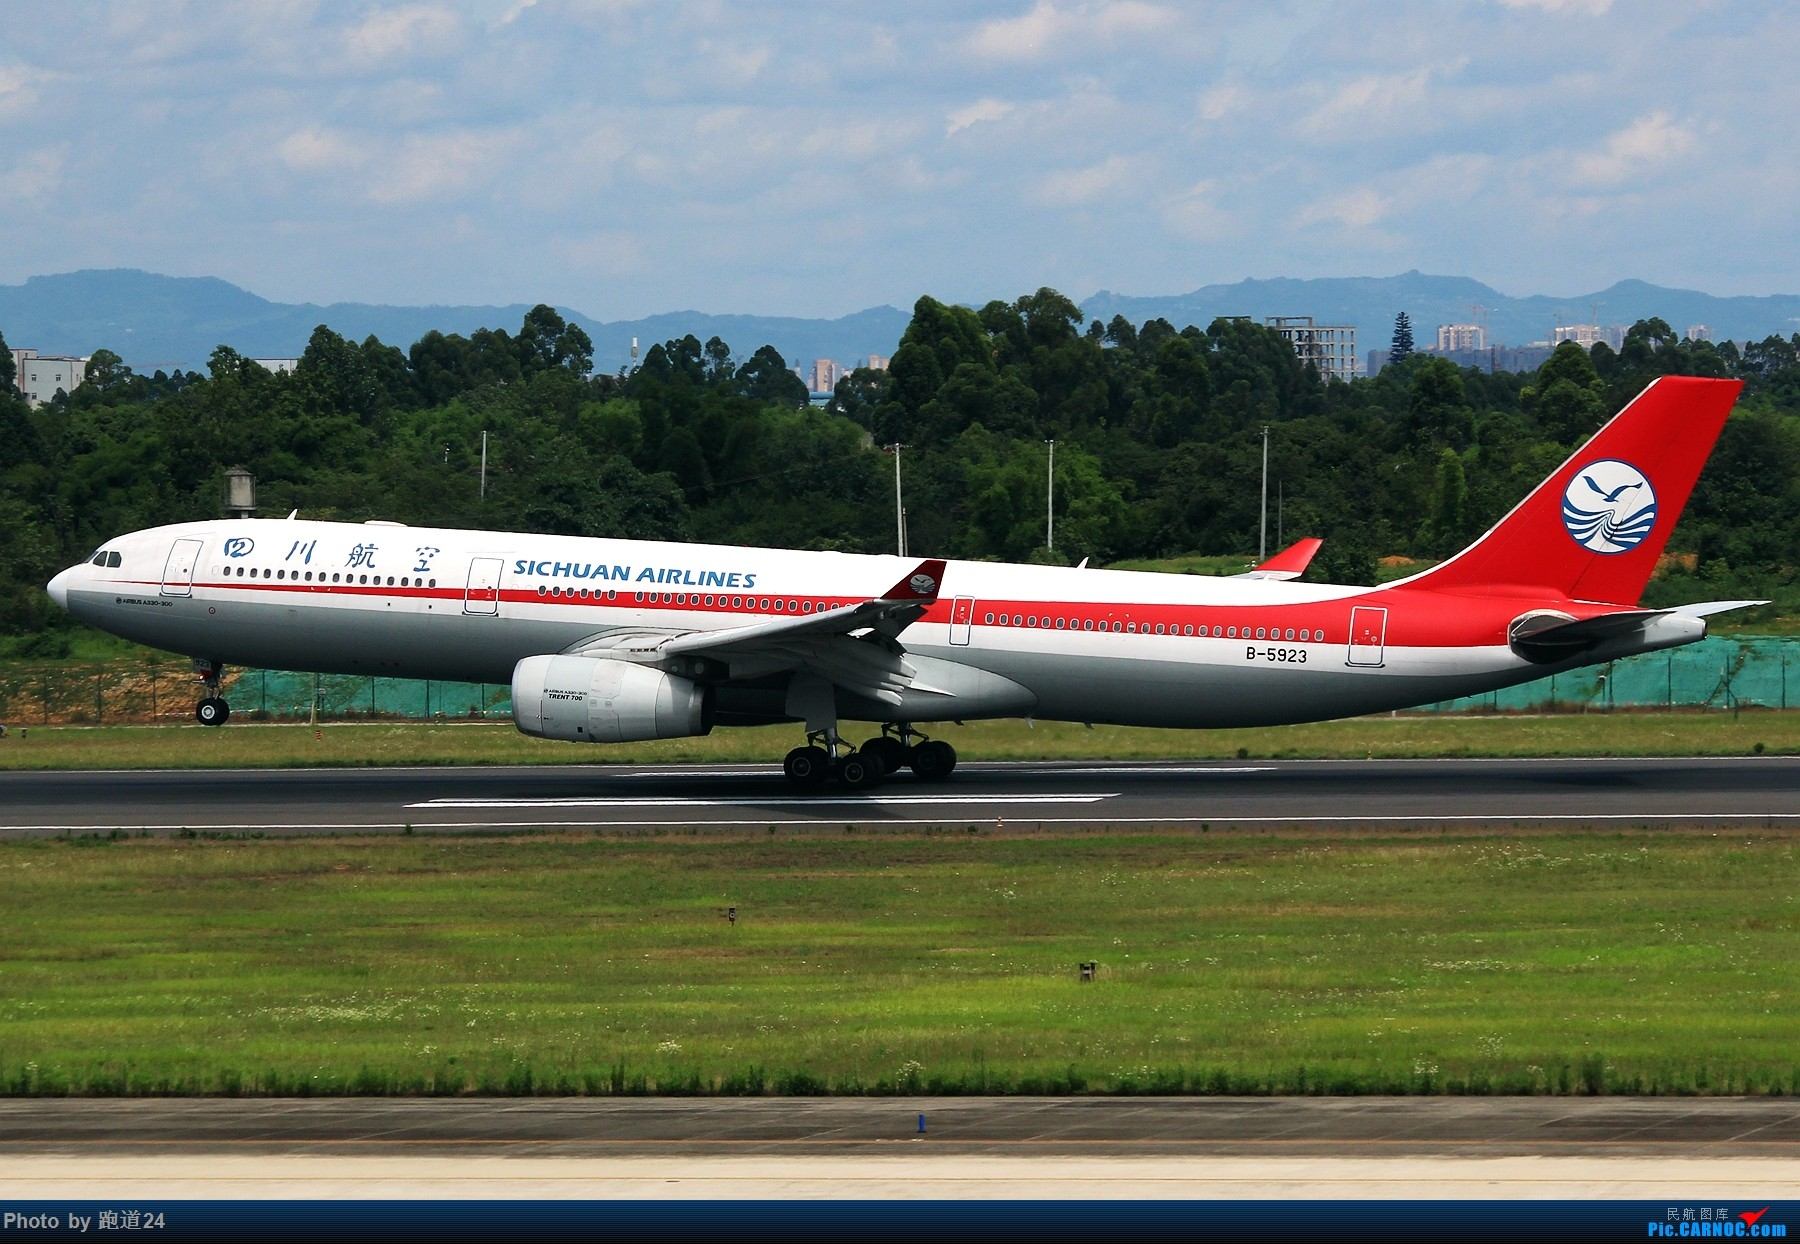 Re:[原创]【多图党】6月18日成都拍机【埃塞俄比亚航空B777-200LR】 AIRBUS A330-300 B-5923 中国成都双流国际机场